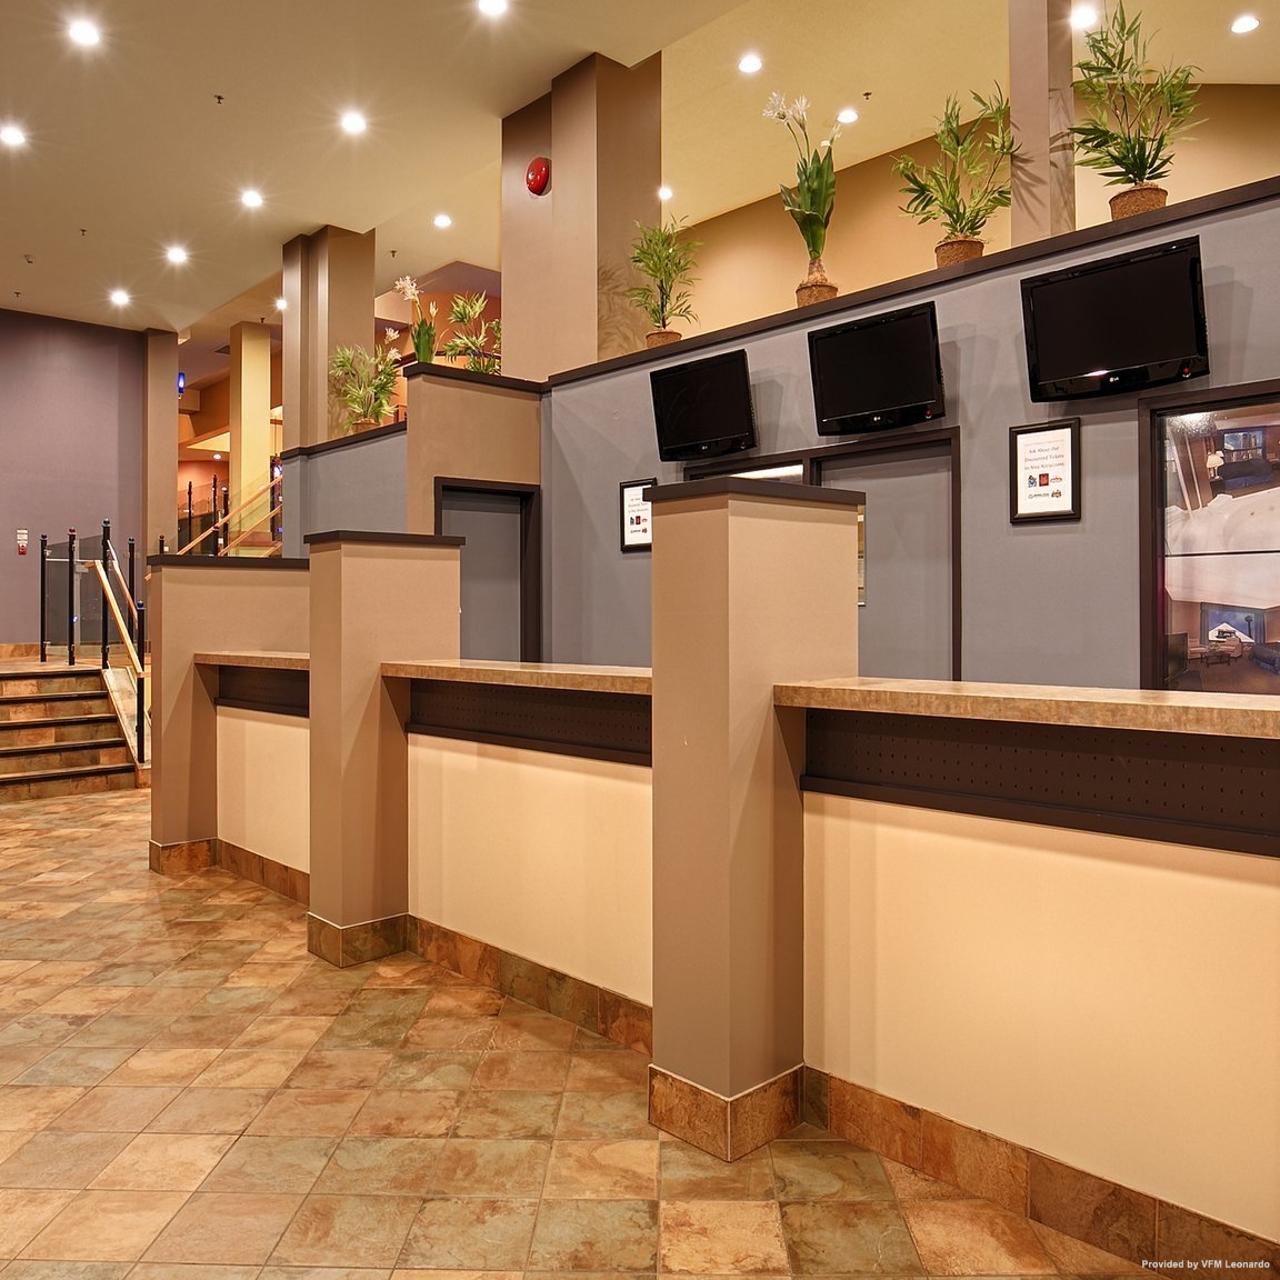 Hotel Best Western Fallsview In Niagara Falls Ontario Hrs